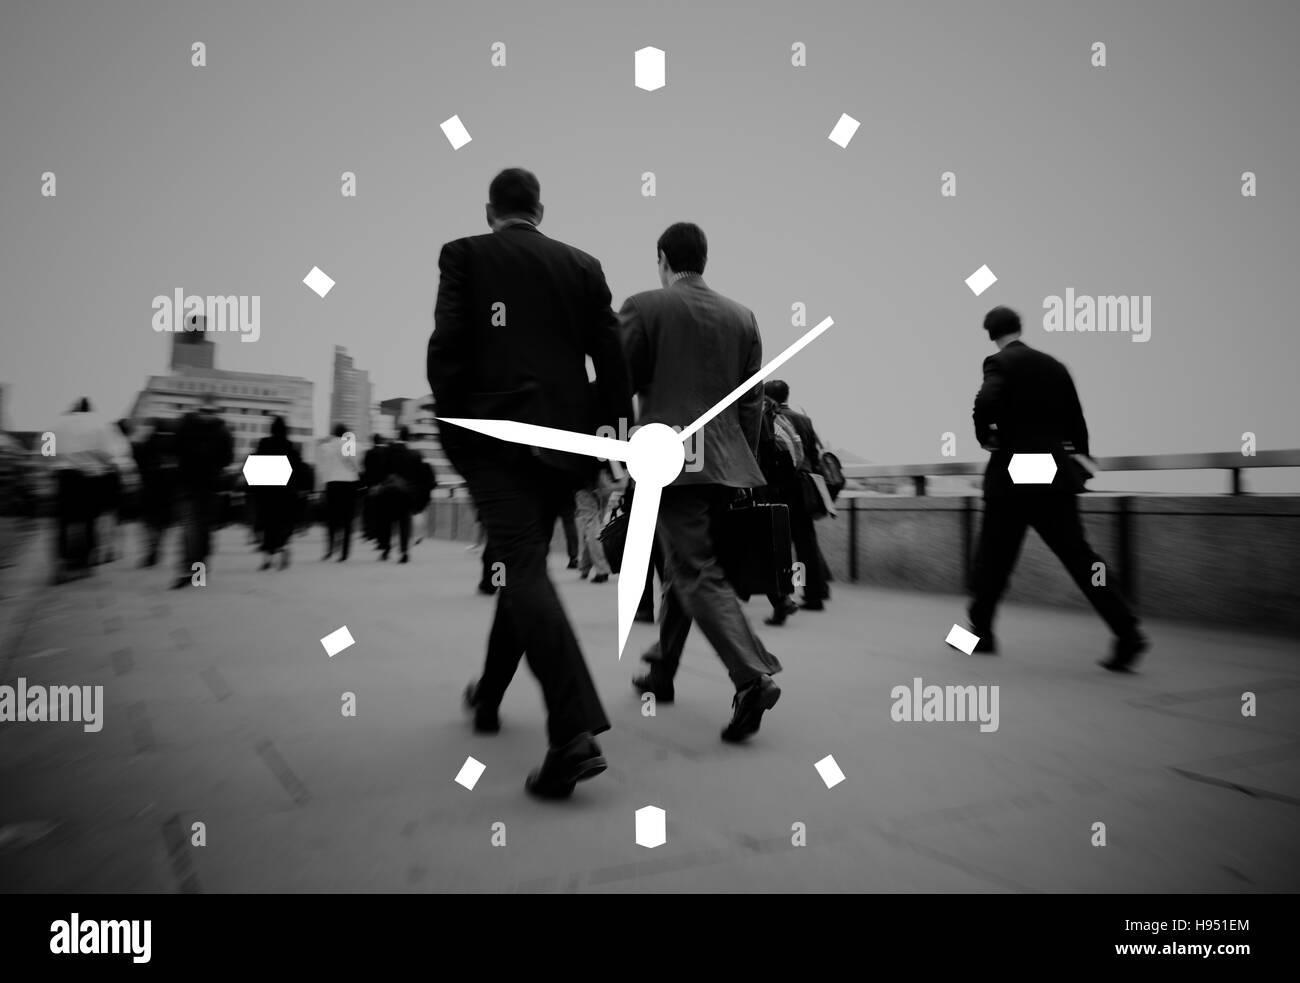 Time Management Clock Alarm Measure Concept - Stock Image